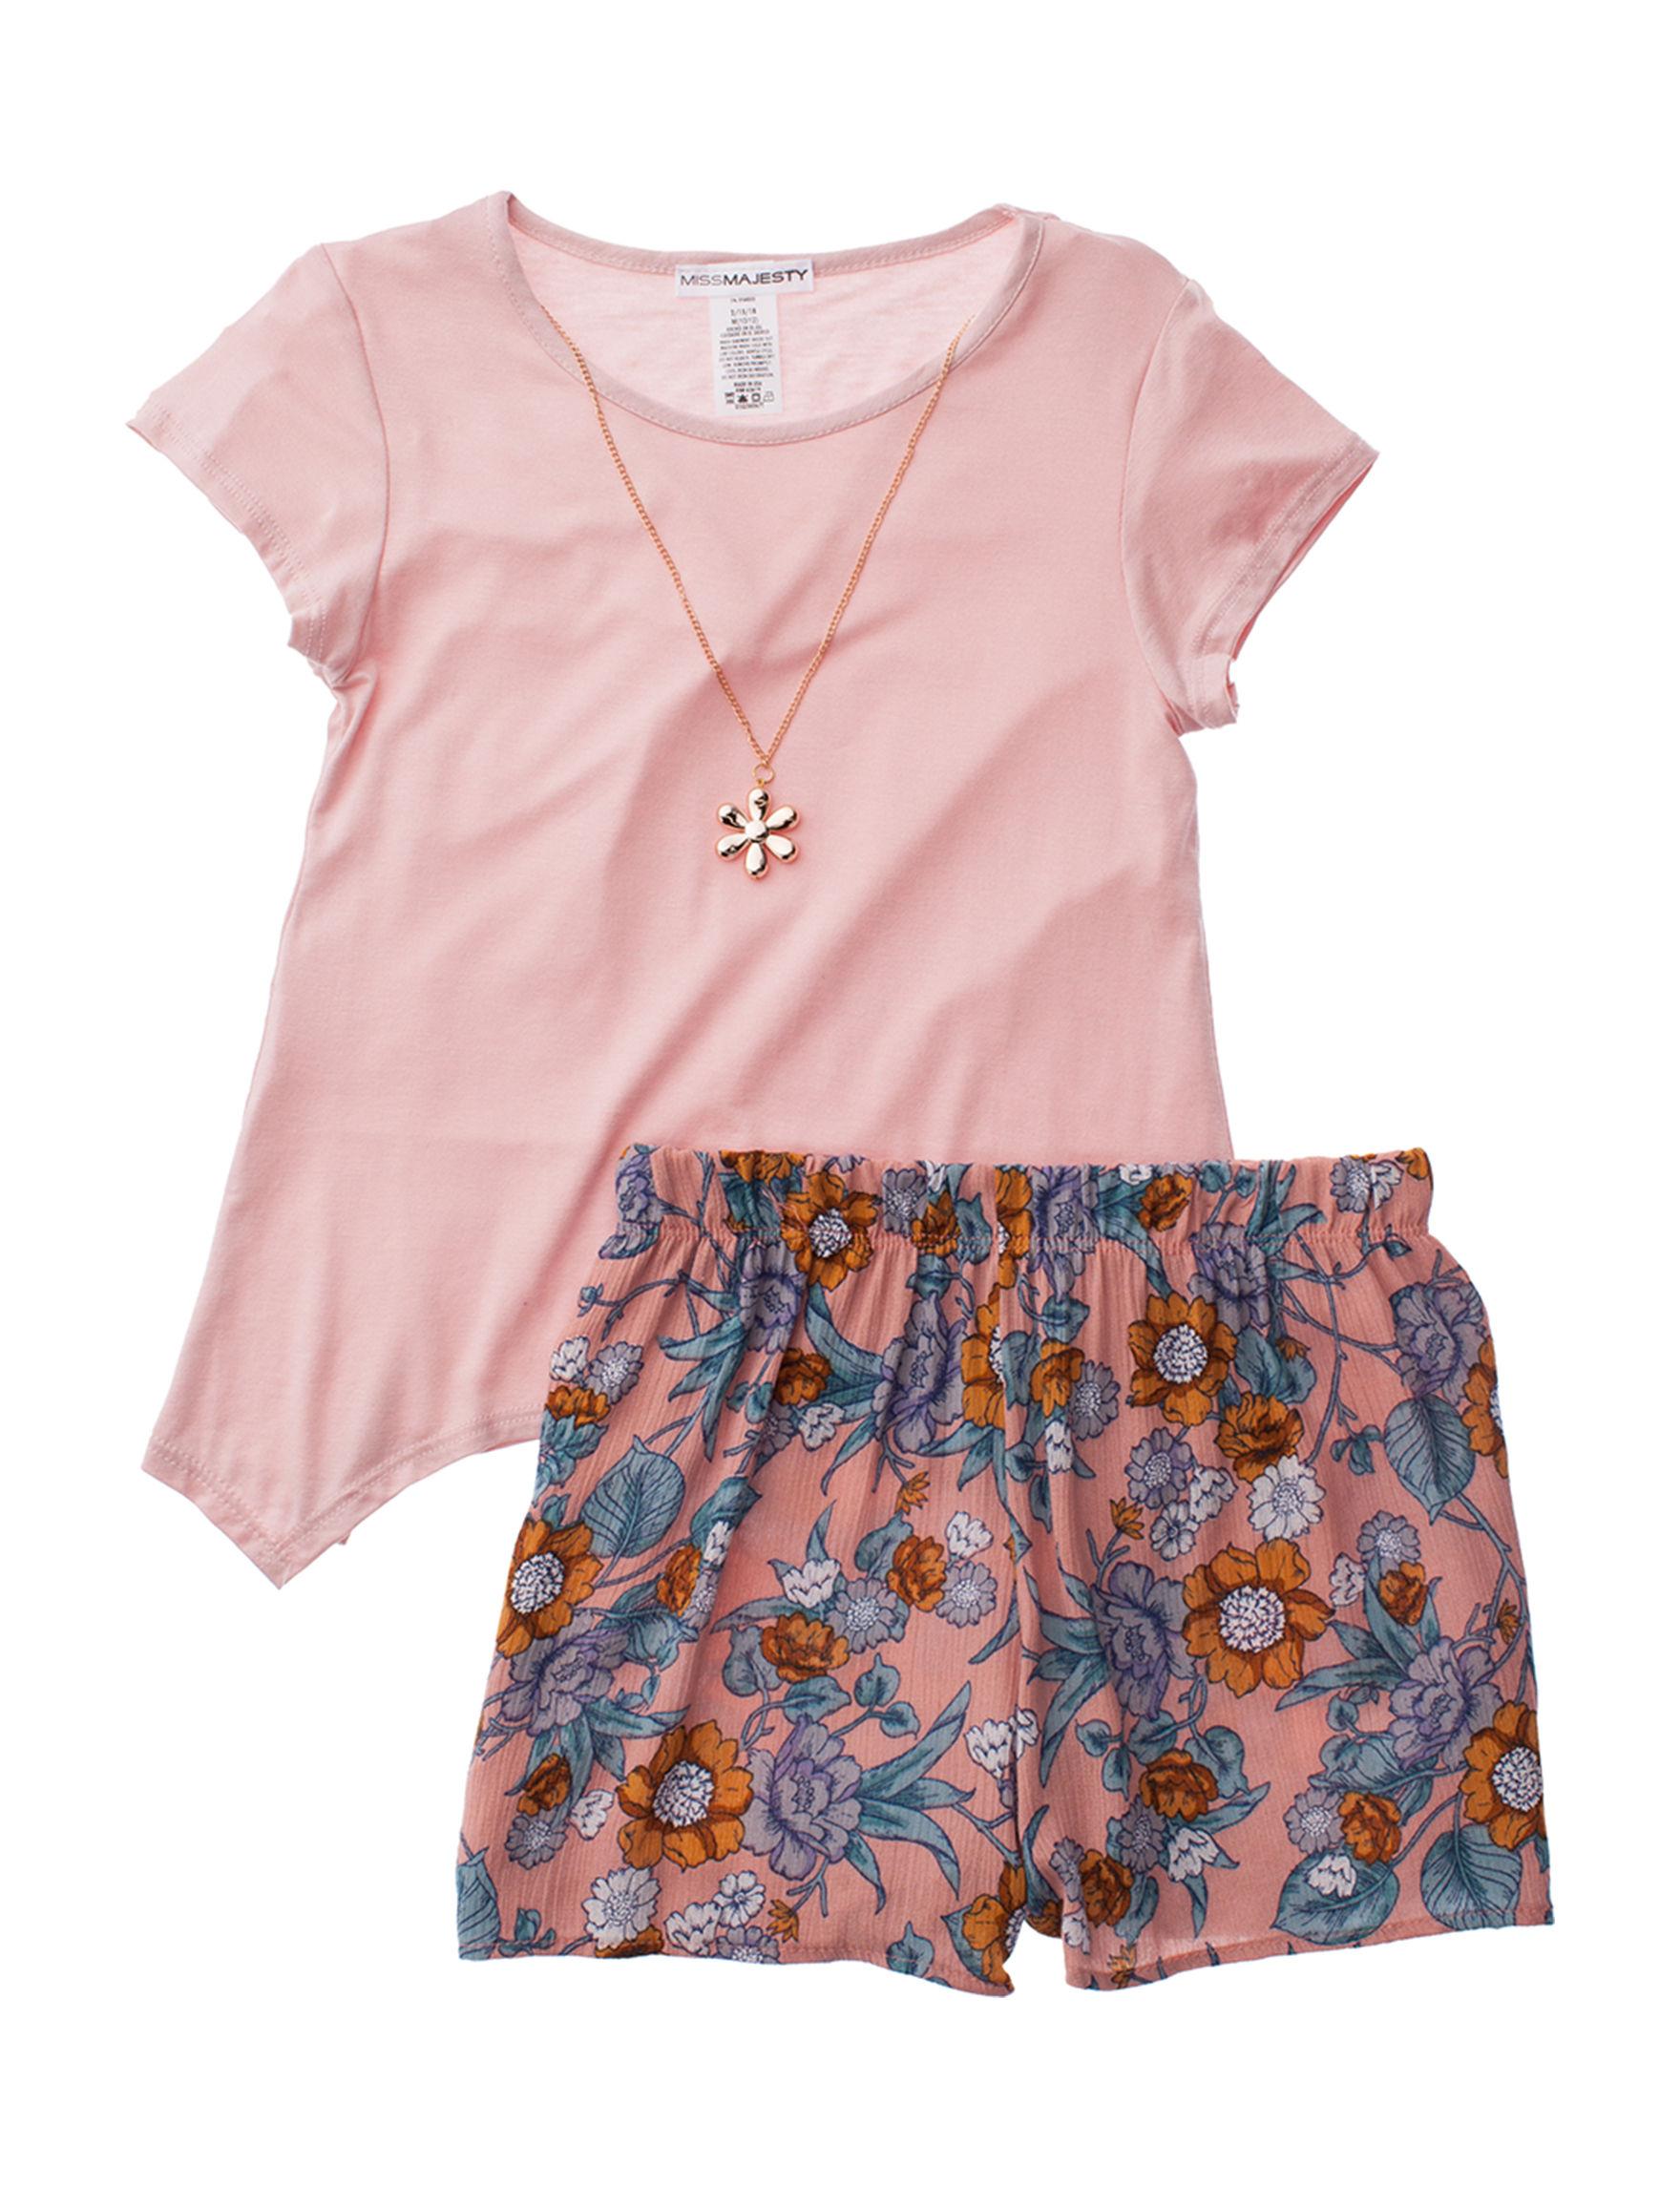 Miss Majesty Blush / Multi Soft Shorts